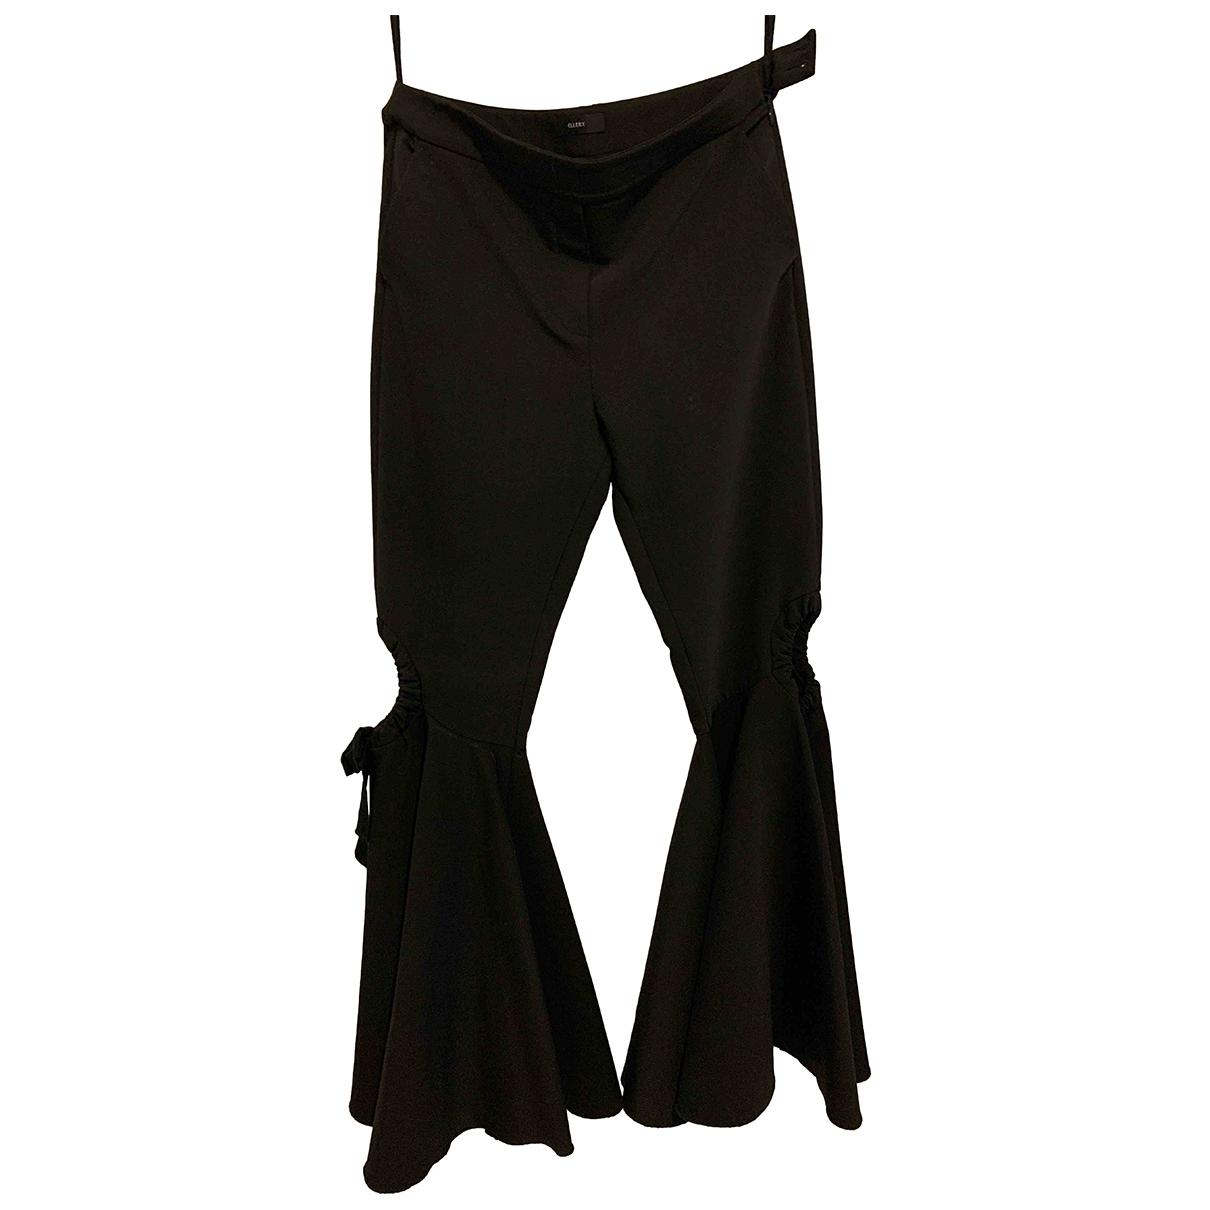 Ellery \N Black Trousers for Women 14 UK